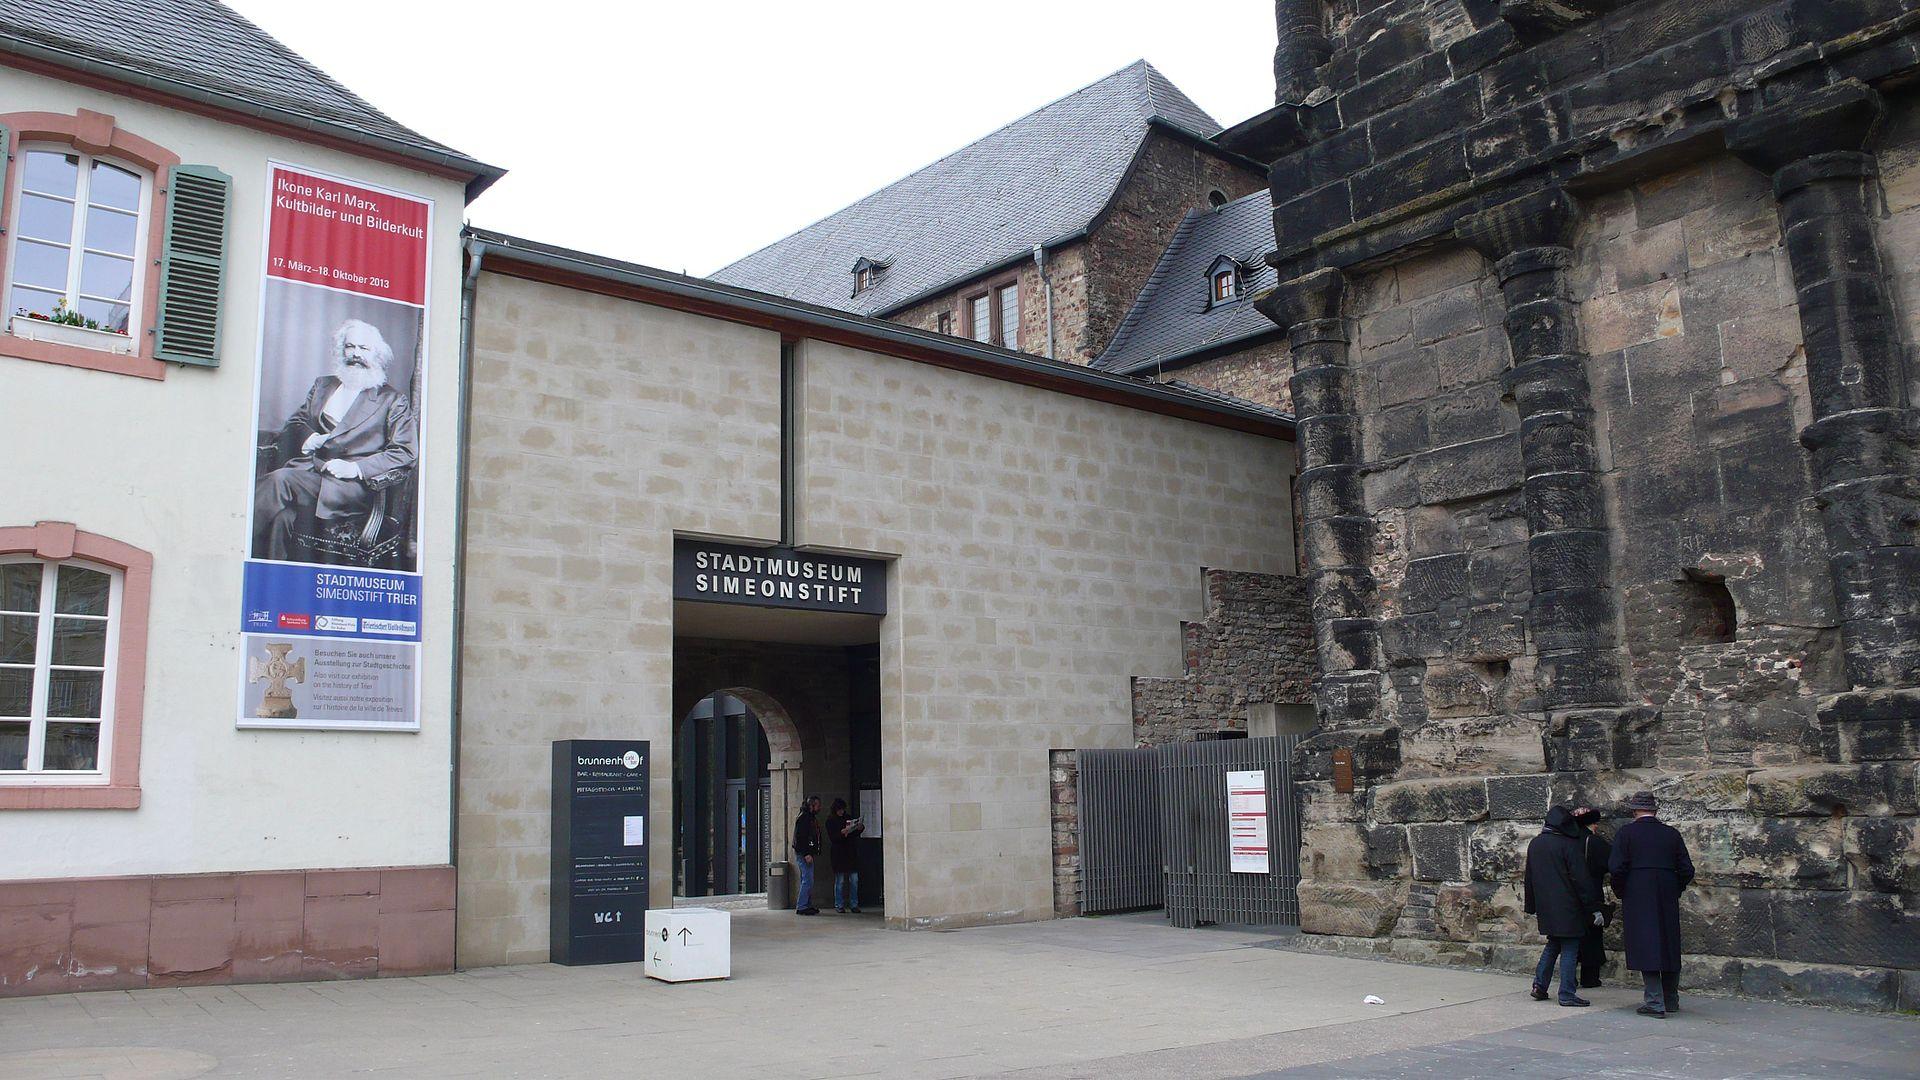 Bild Stadtmuseum Simeonstift Trier